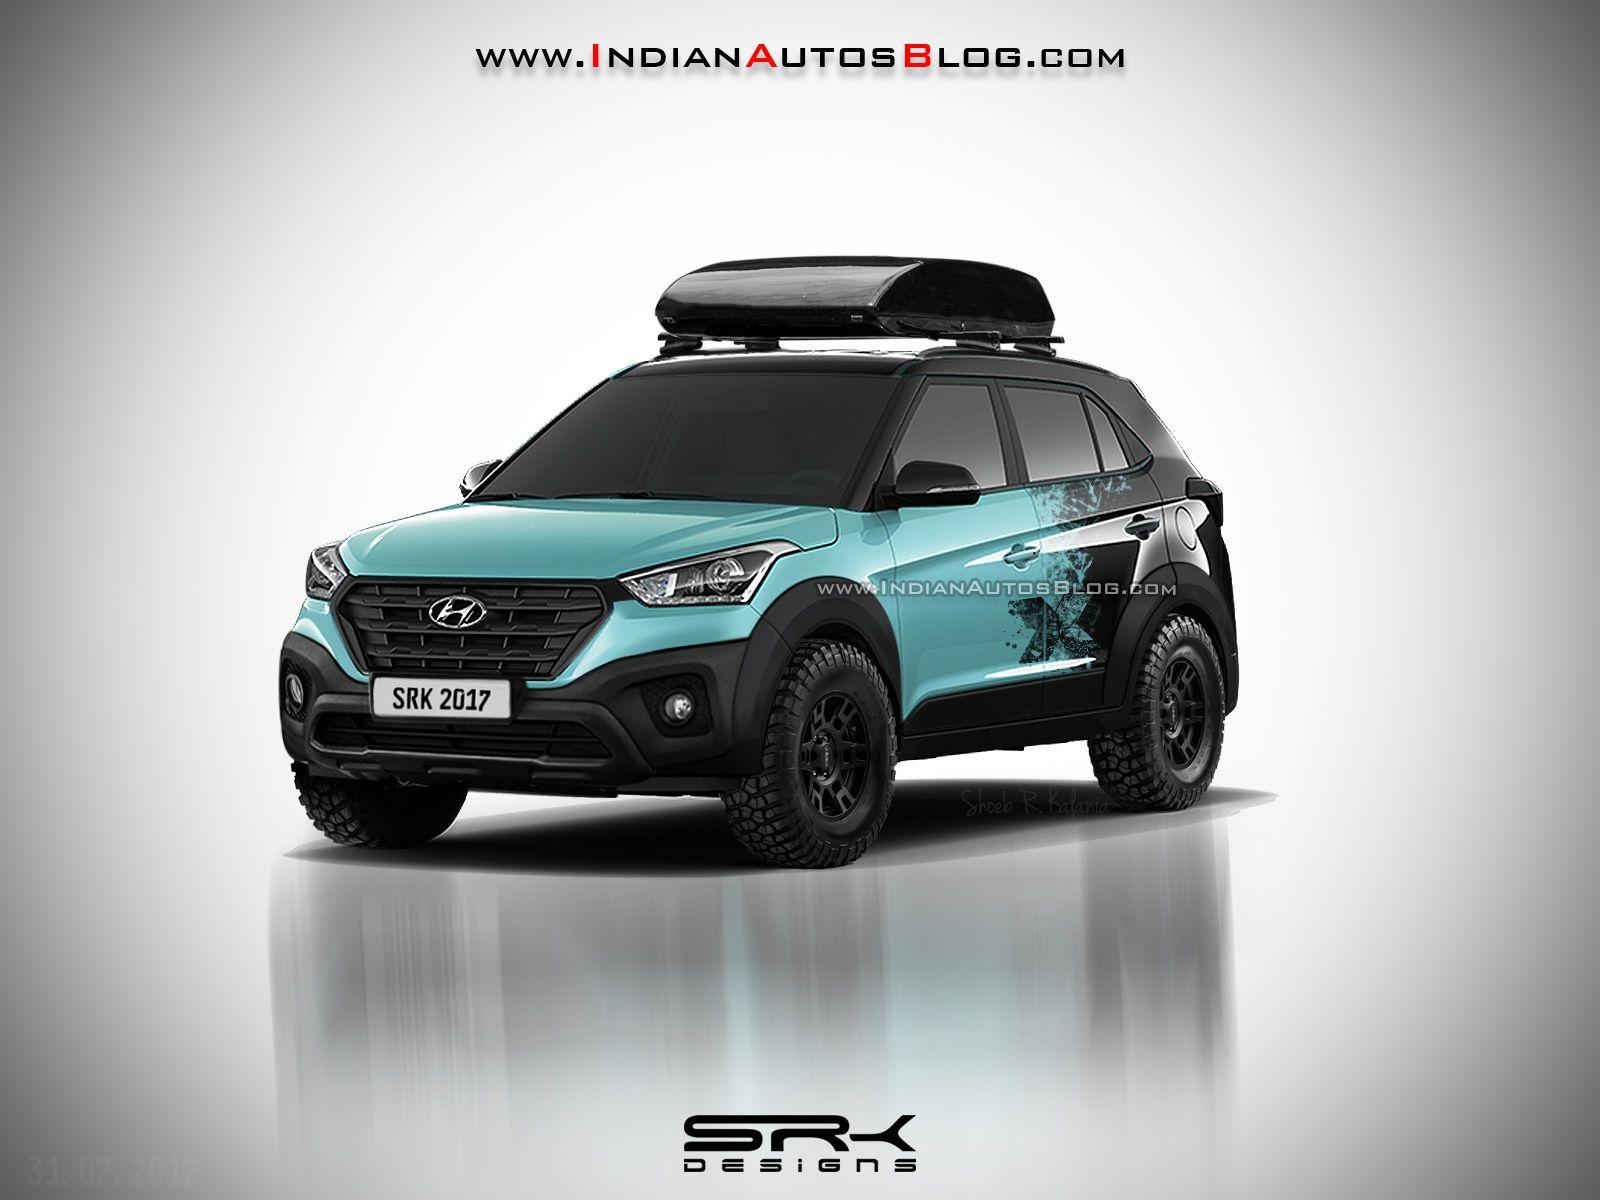 Hyundai Creta X With Off Road Modifications Rendered Hyundai Custom Cars Offroad